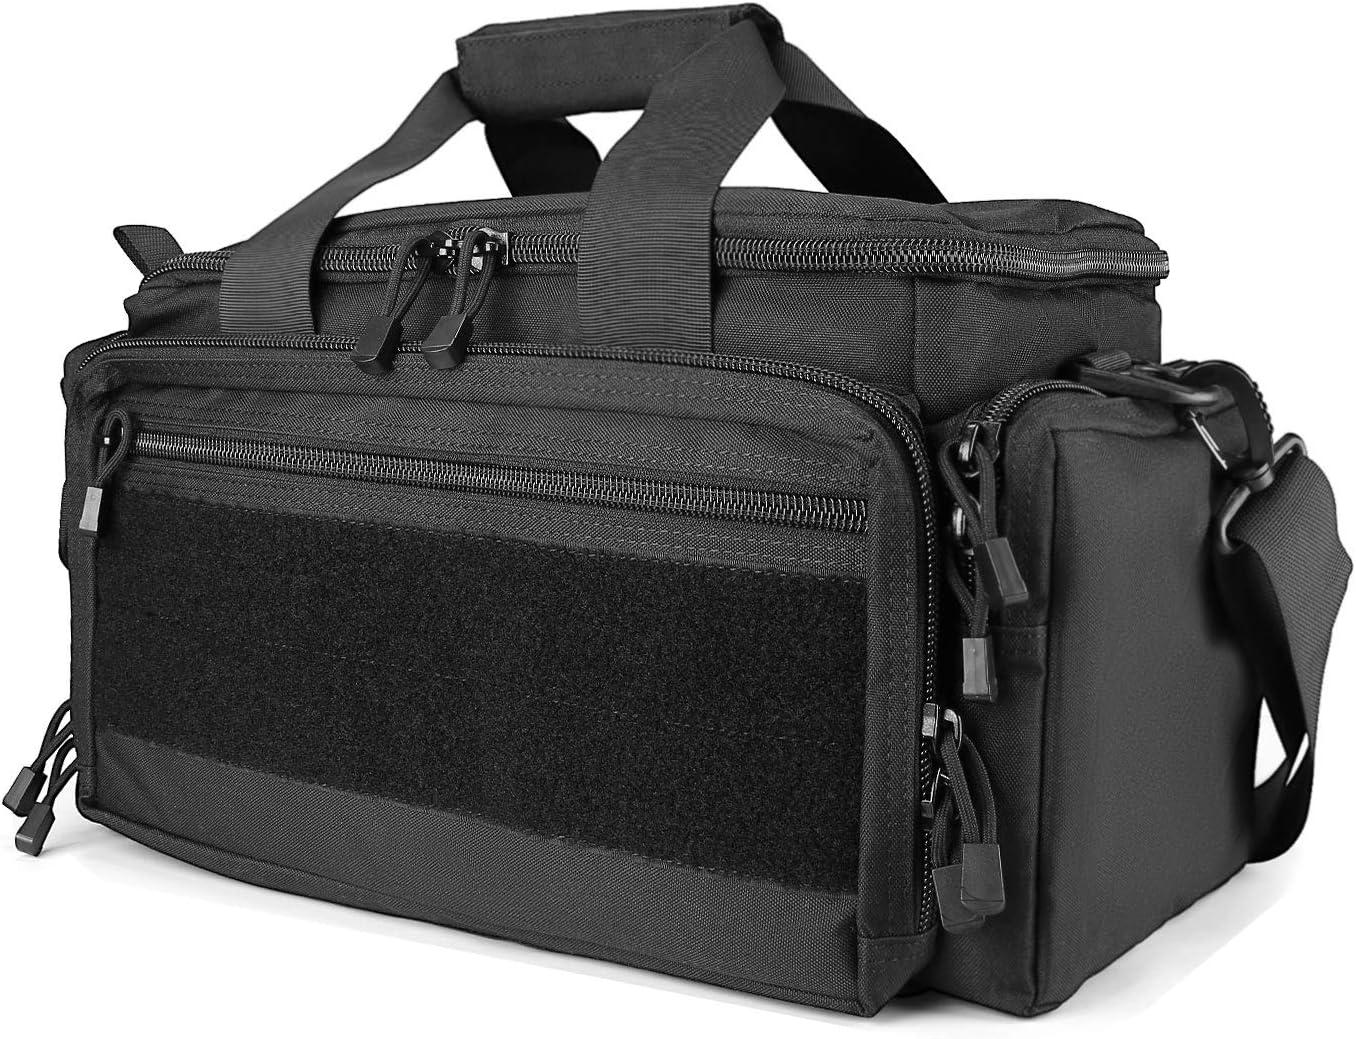 Polaland Tactical Gun Range Bag Pistol Shooting Duffle Bag, Deluxe Padded Shooting Range Bag Large Handguns Magazine Ammo Gear Accessories Pouch for Hunting Shooting Range Sport